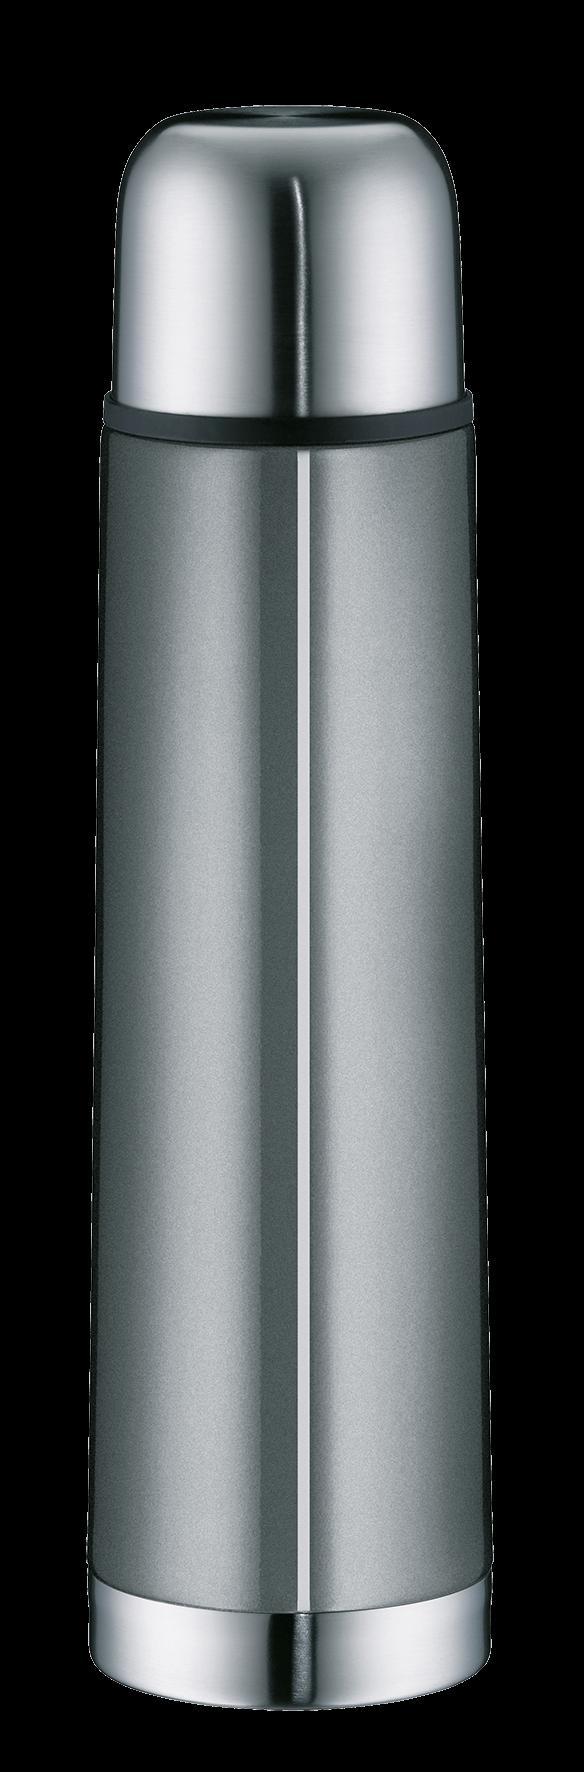 Alfi-Isotherm-Eco-0-75-L-Space-Grey